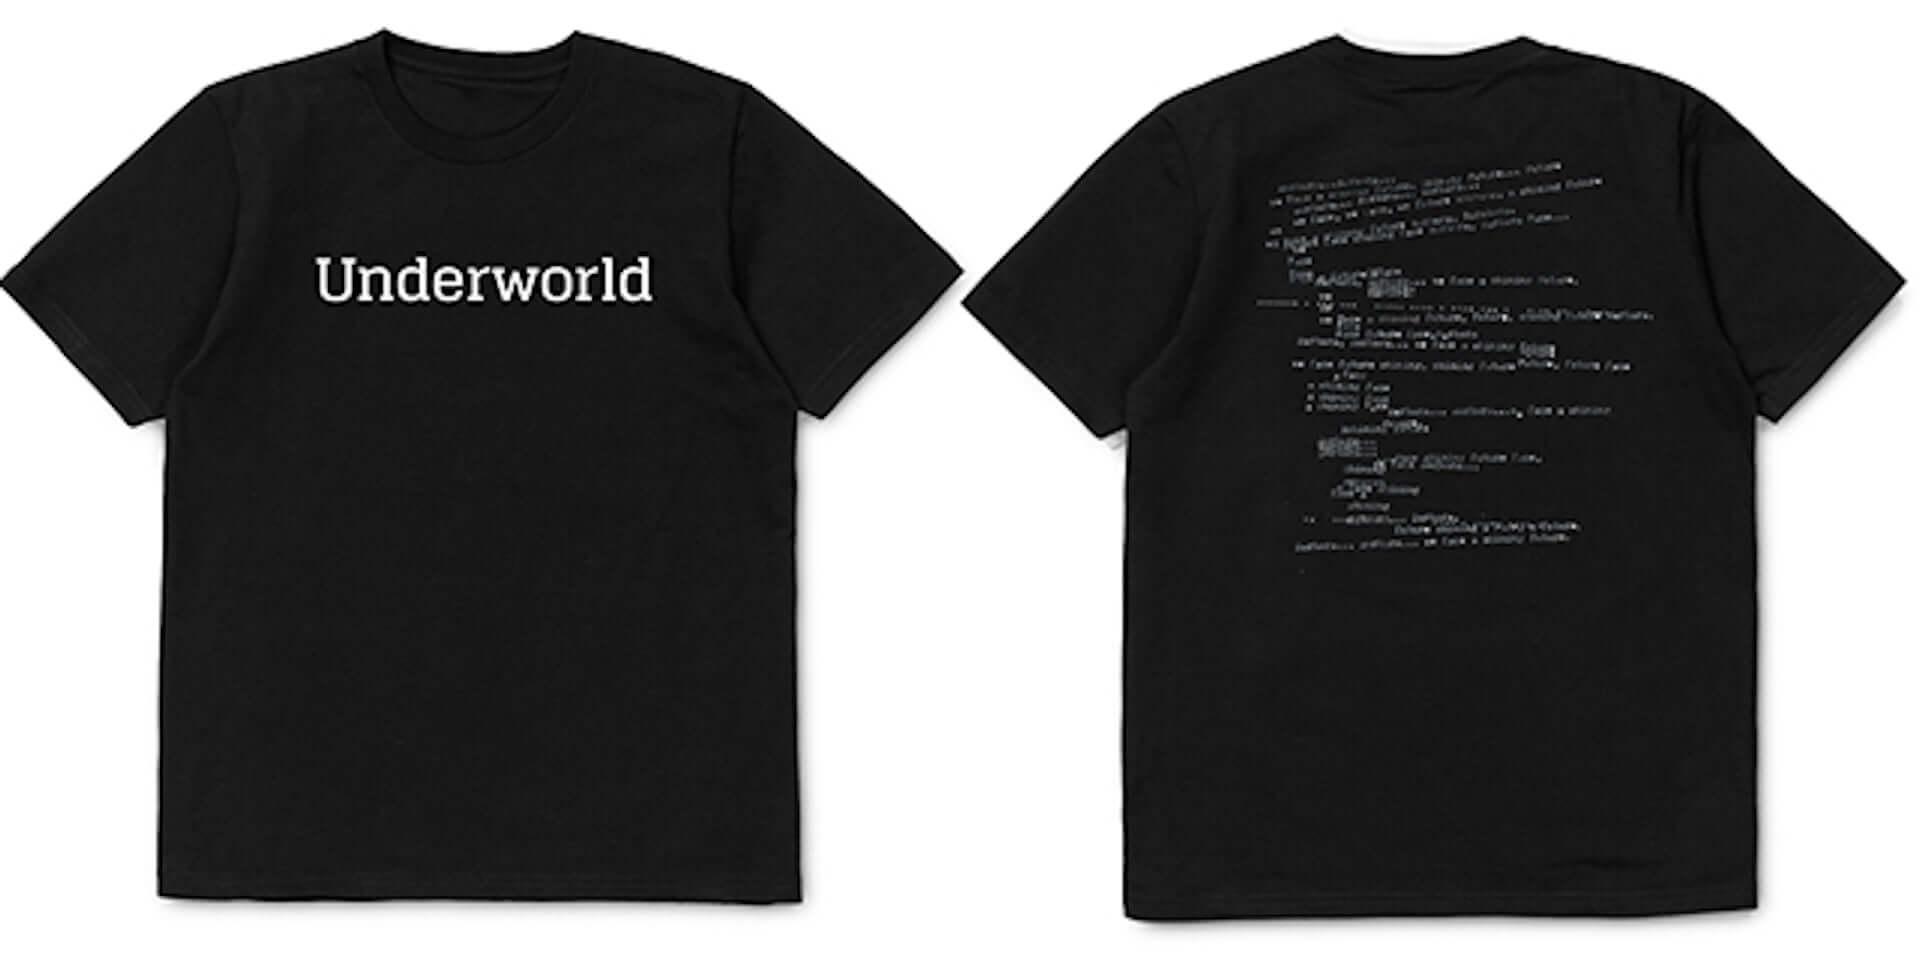 Underworldの伝説のステージ<SUMMER SONIC 2016>の記録映像が明日配信!当時のライブレポートが公開&公式Tシャツが復刻決定 music200626_underworld_12-1920x960